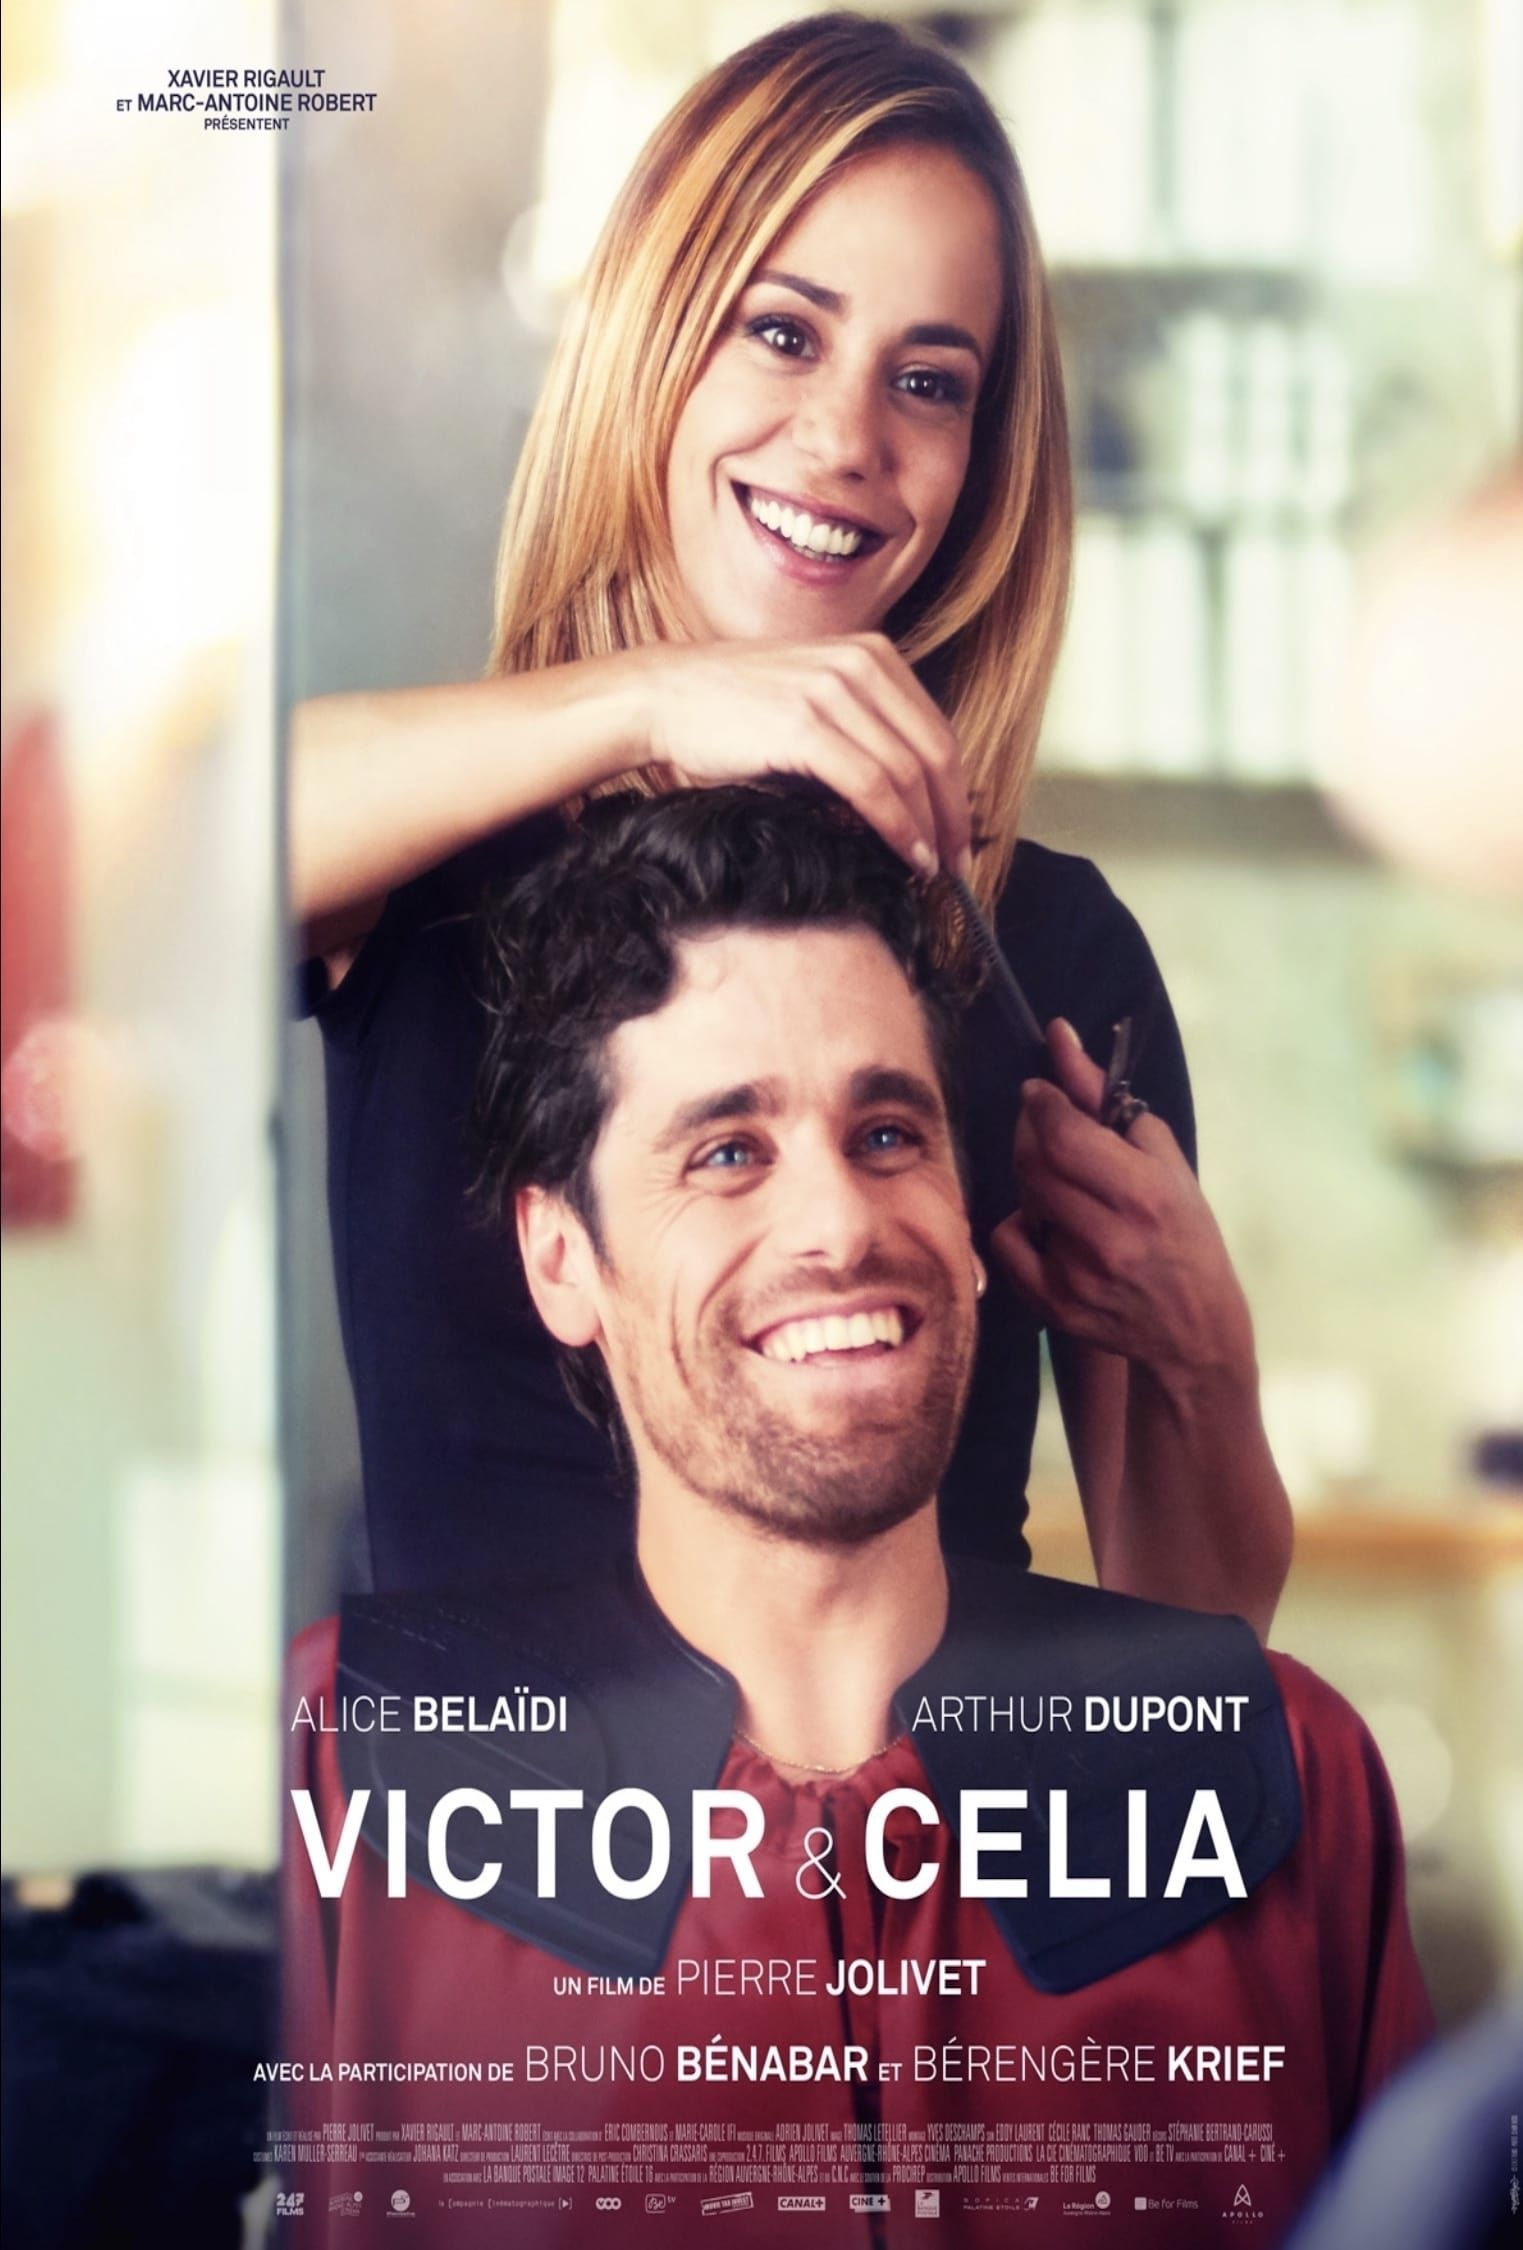 Victor Et Celia 2019 Online Teljes Film Filmek Magyarul Letoltes Hd Stand Up Comedians Movie Releases Free Movies Online